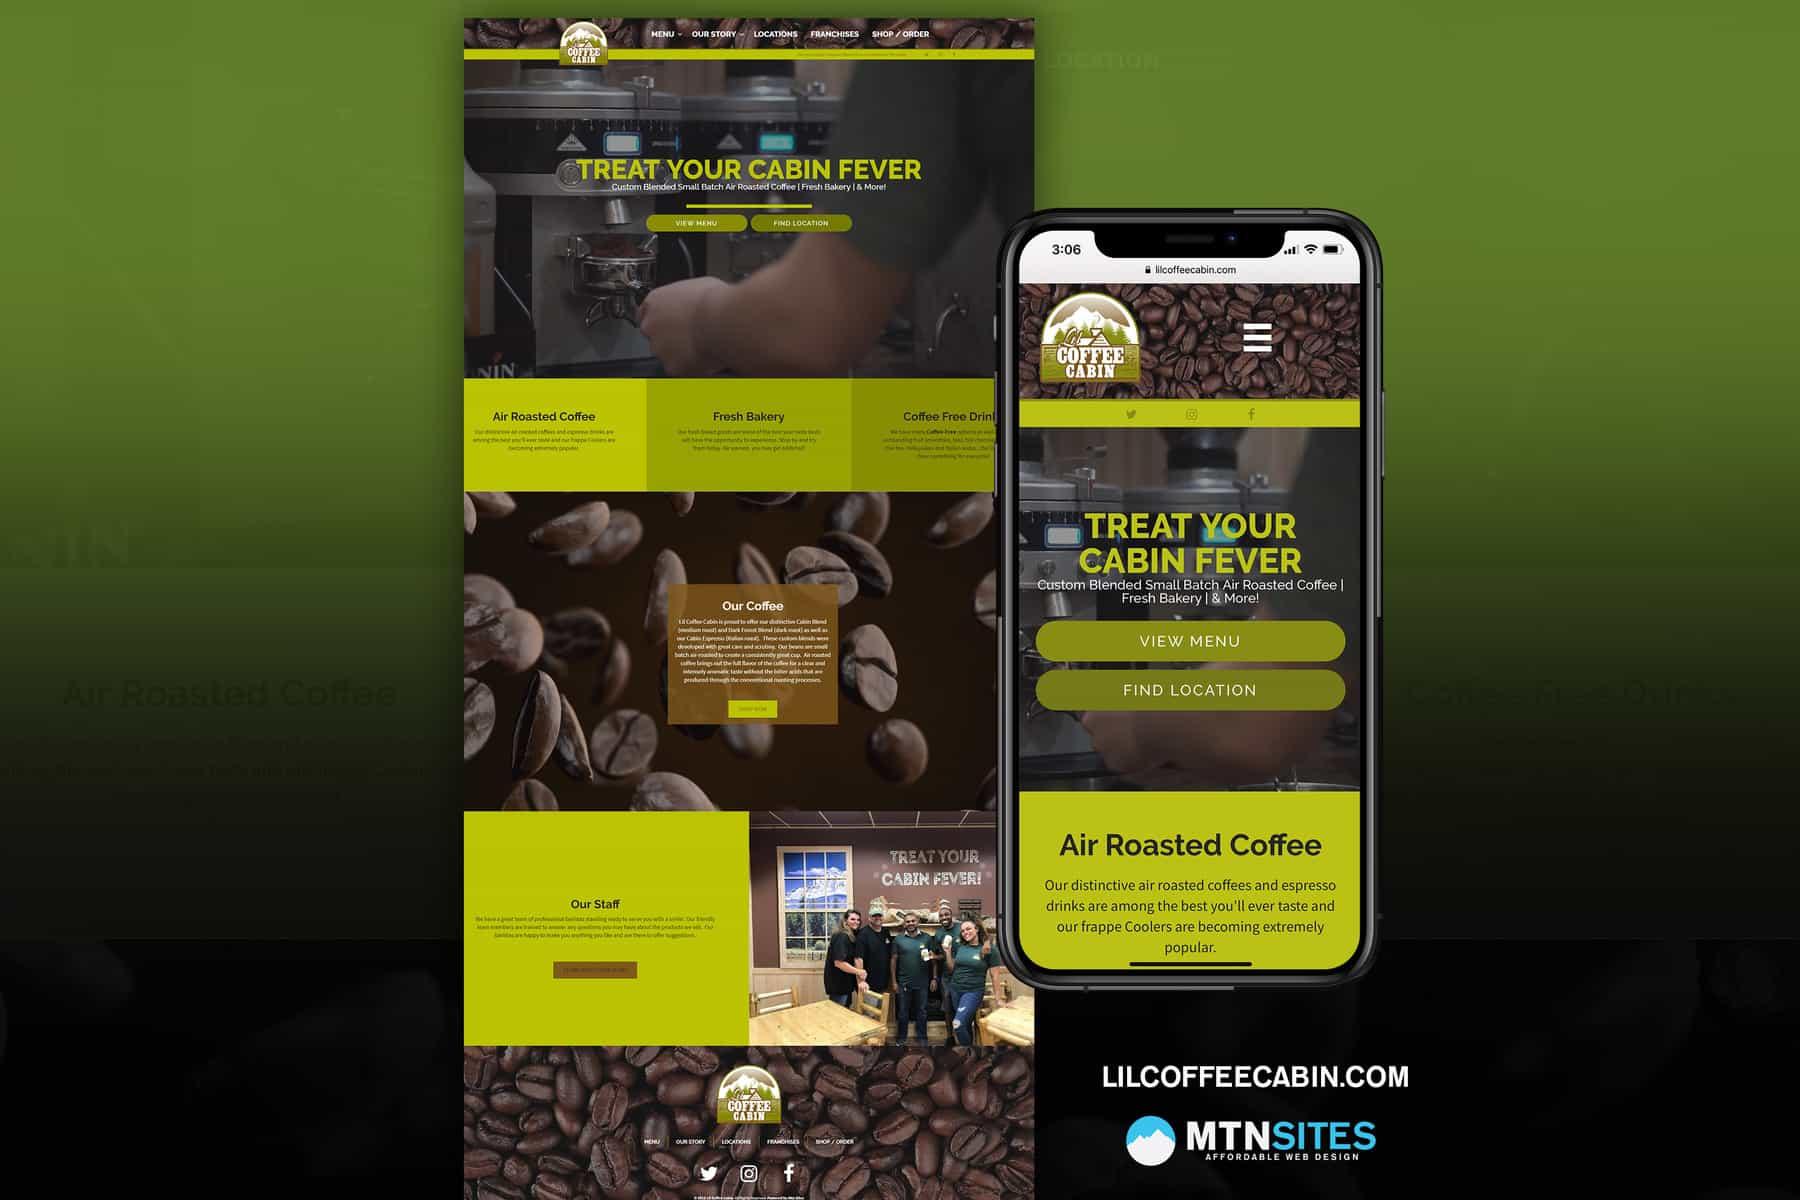 lilcoffeecabin mtn site